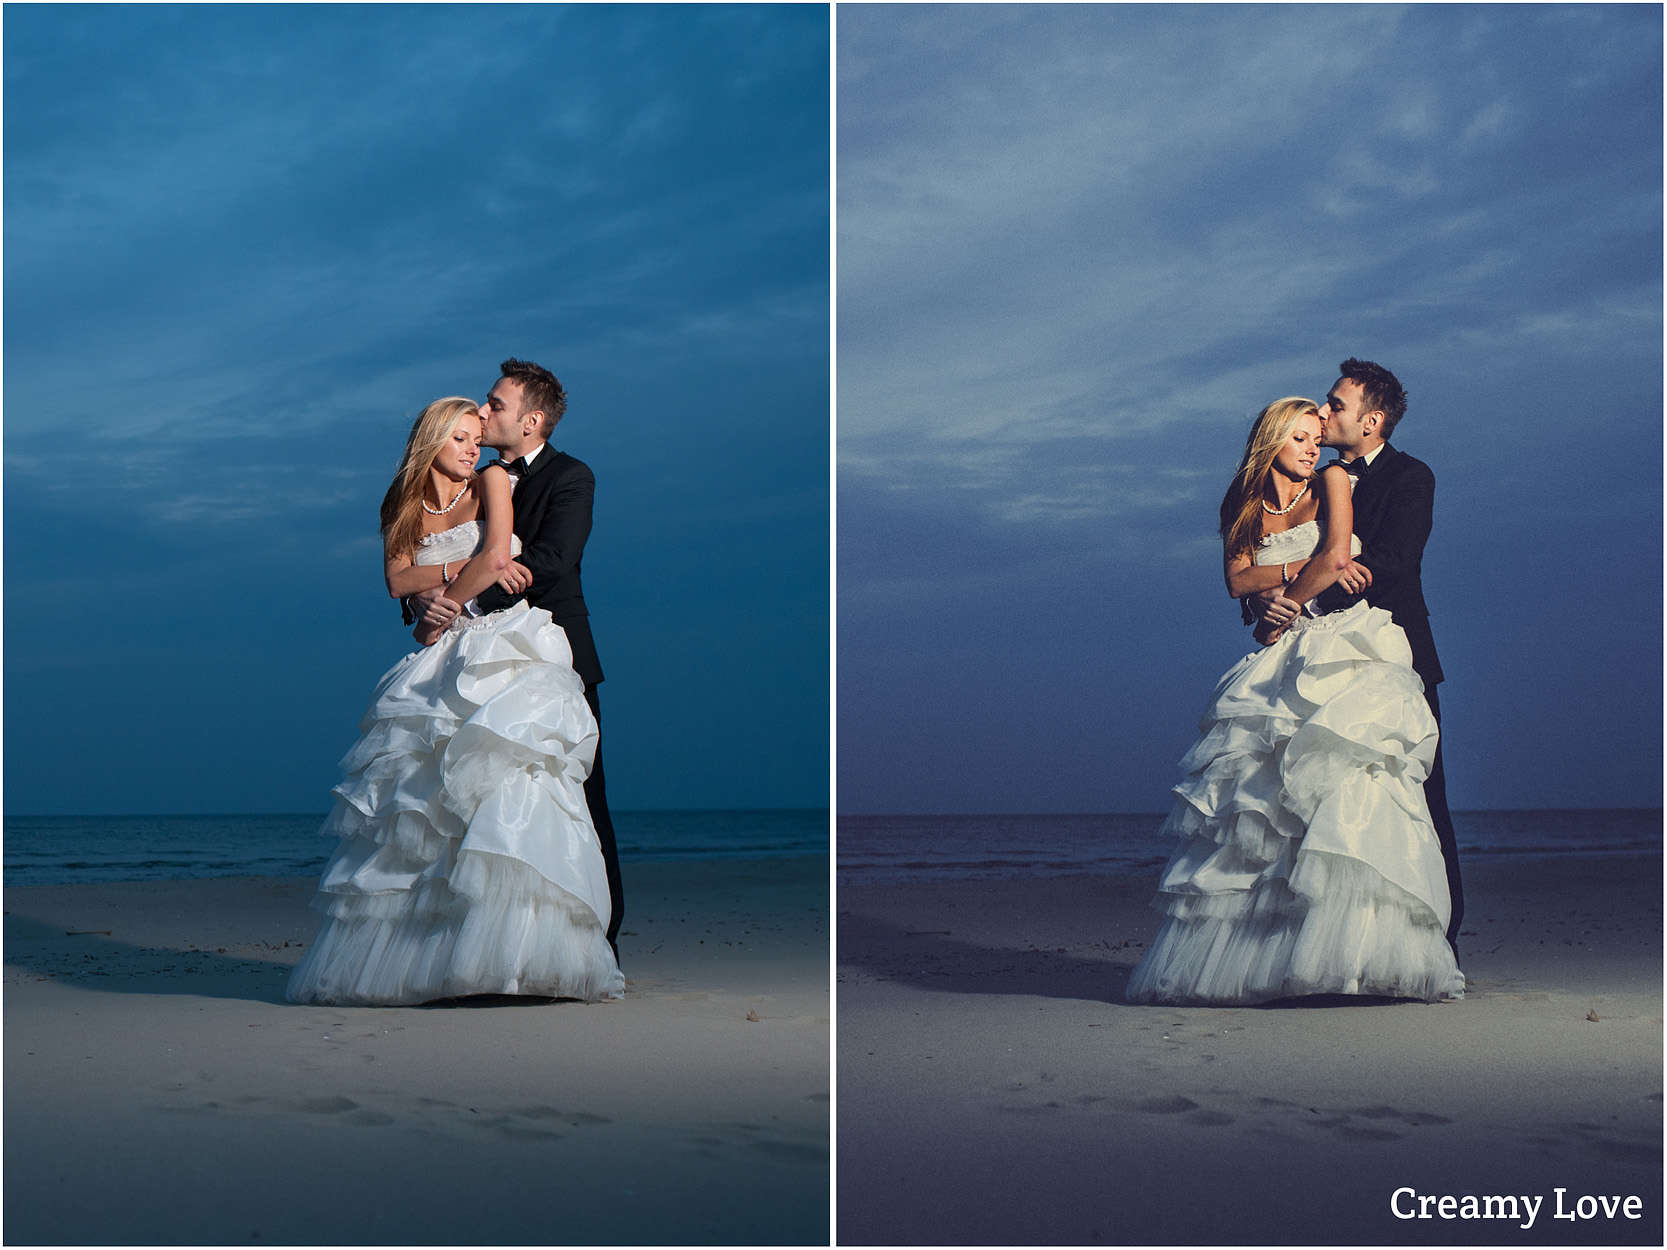 Presety analogowe do Adobe Lightroom i Adobe Camera RAW - ACR Delicious Presets